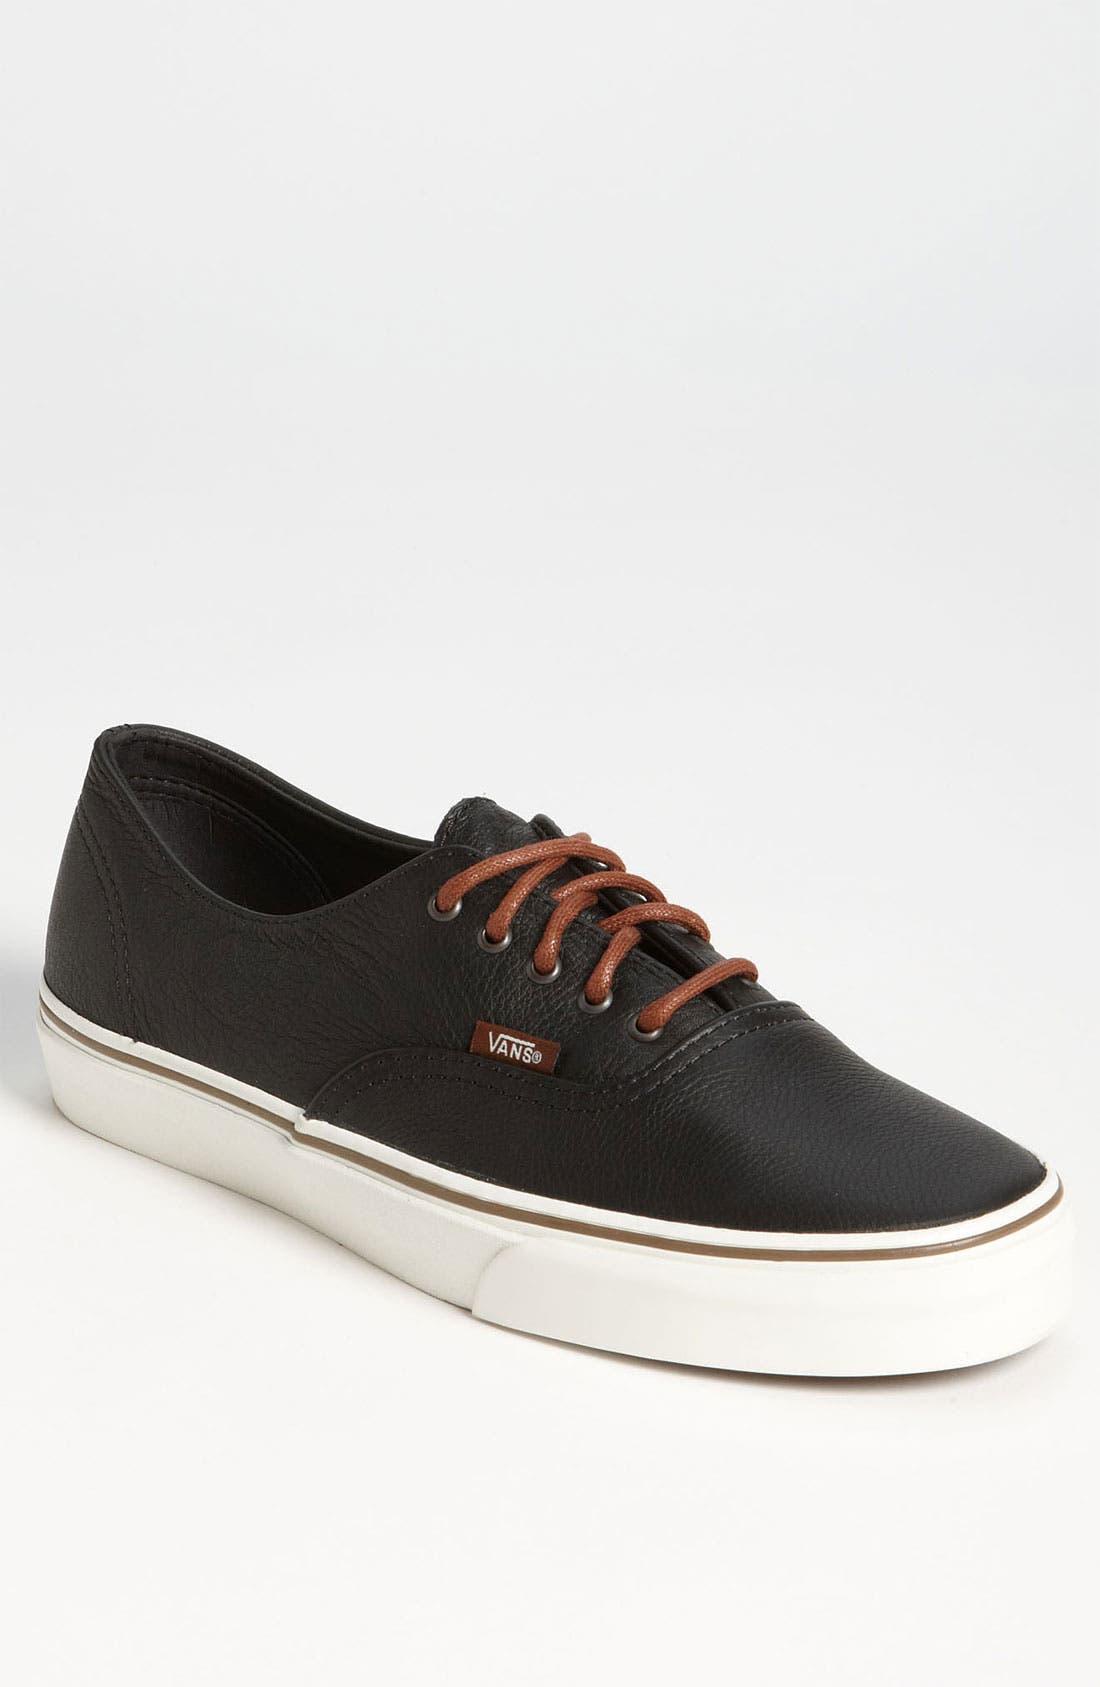 Alternate Image 1 Selected - Vans 'Cali - Authentic Decon' Leather Sneaker (Men)